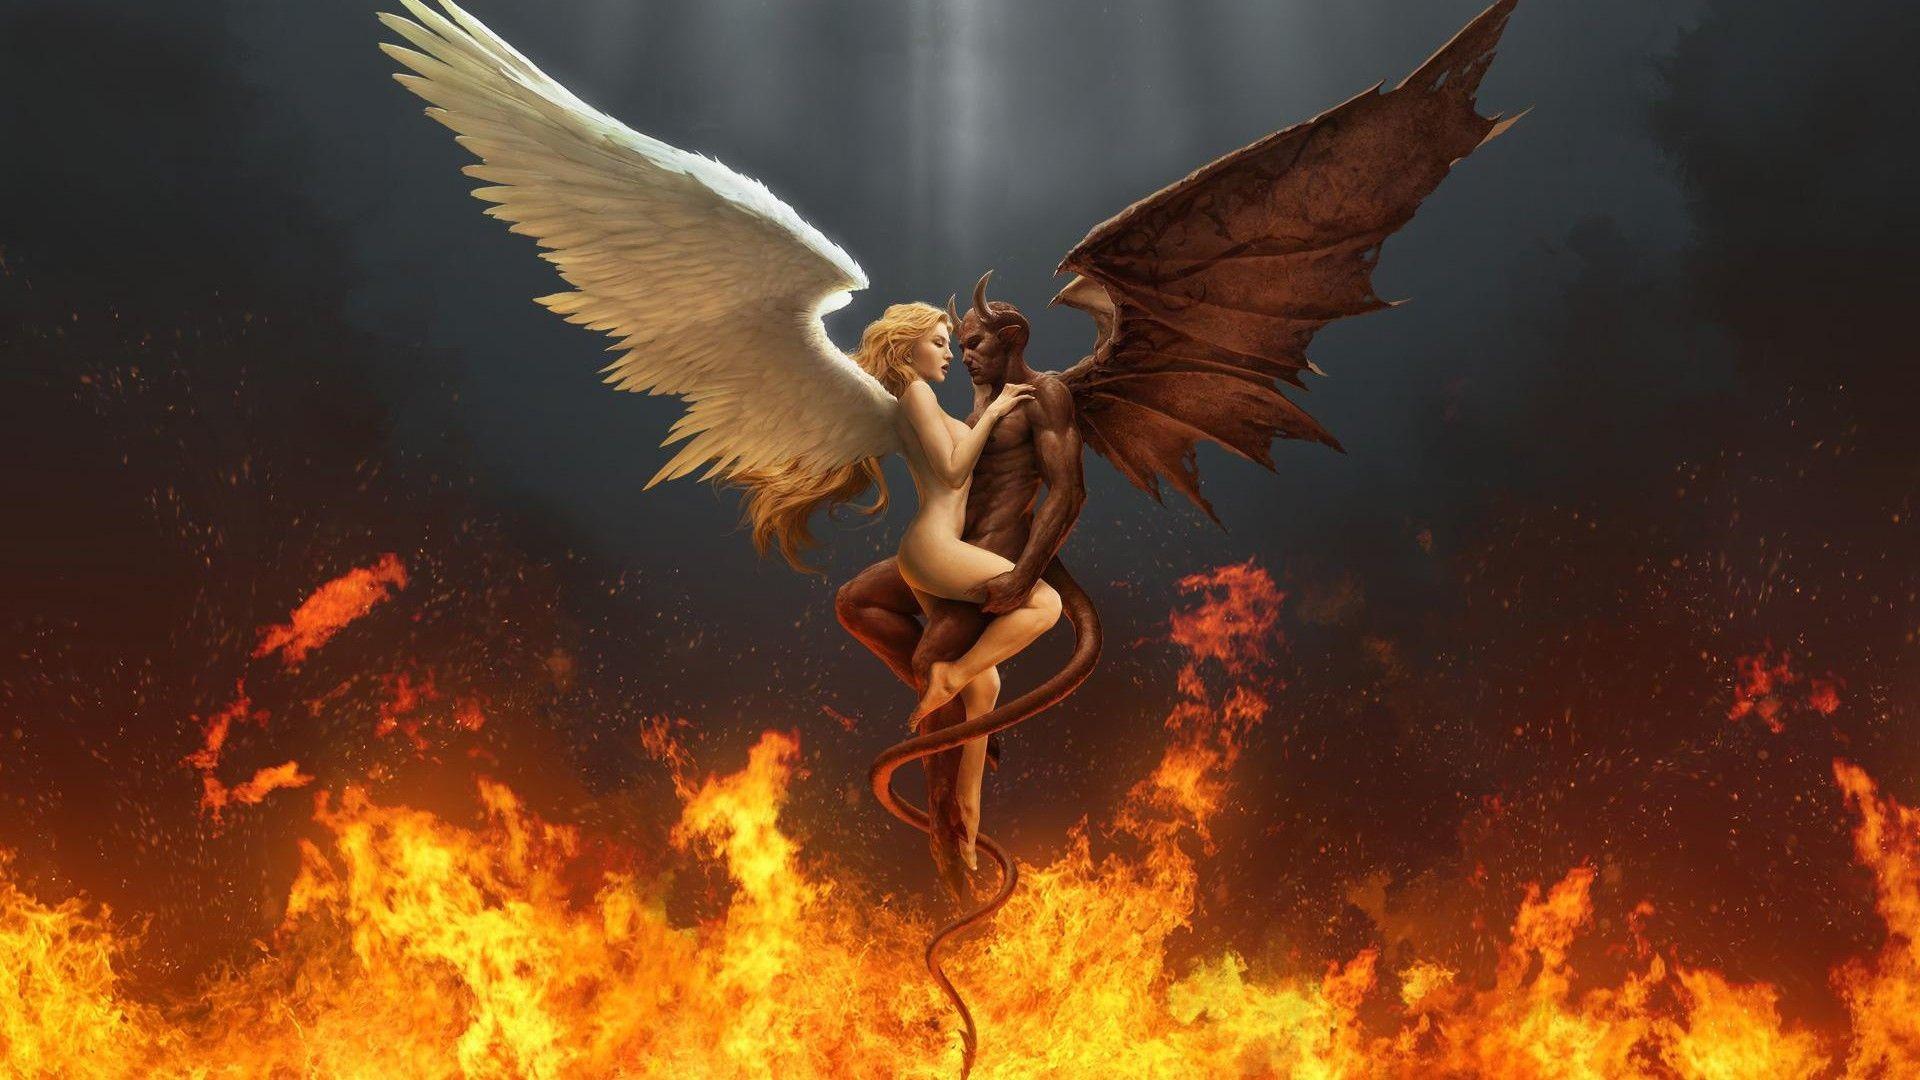 Res: 1920x1080, Scary Demon Wallpaper | ... Digital Art HD Fire Demon Angel Wallpaper -  WallpaperTube